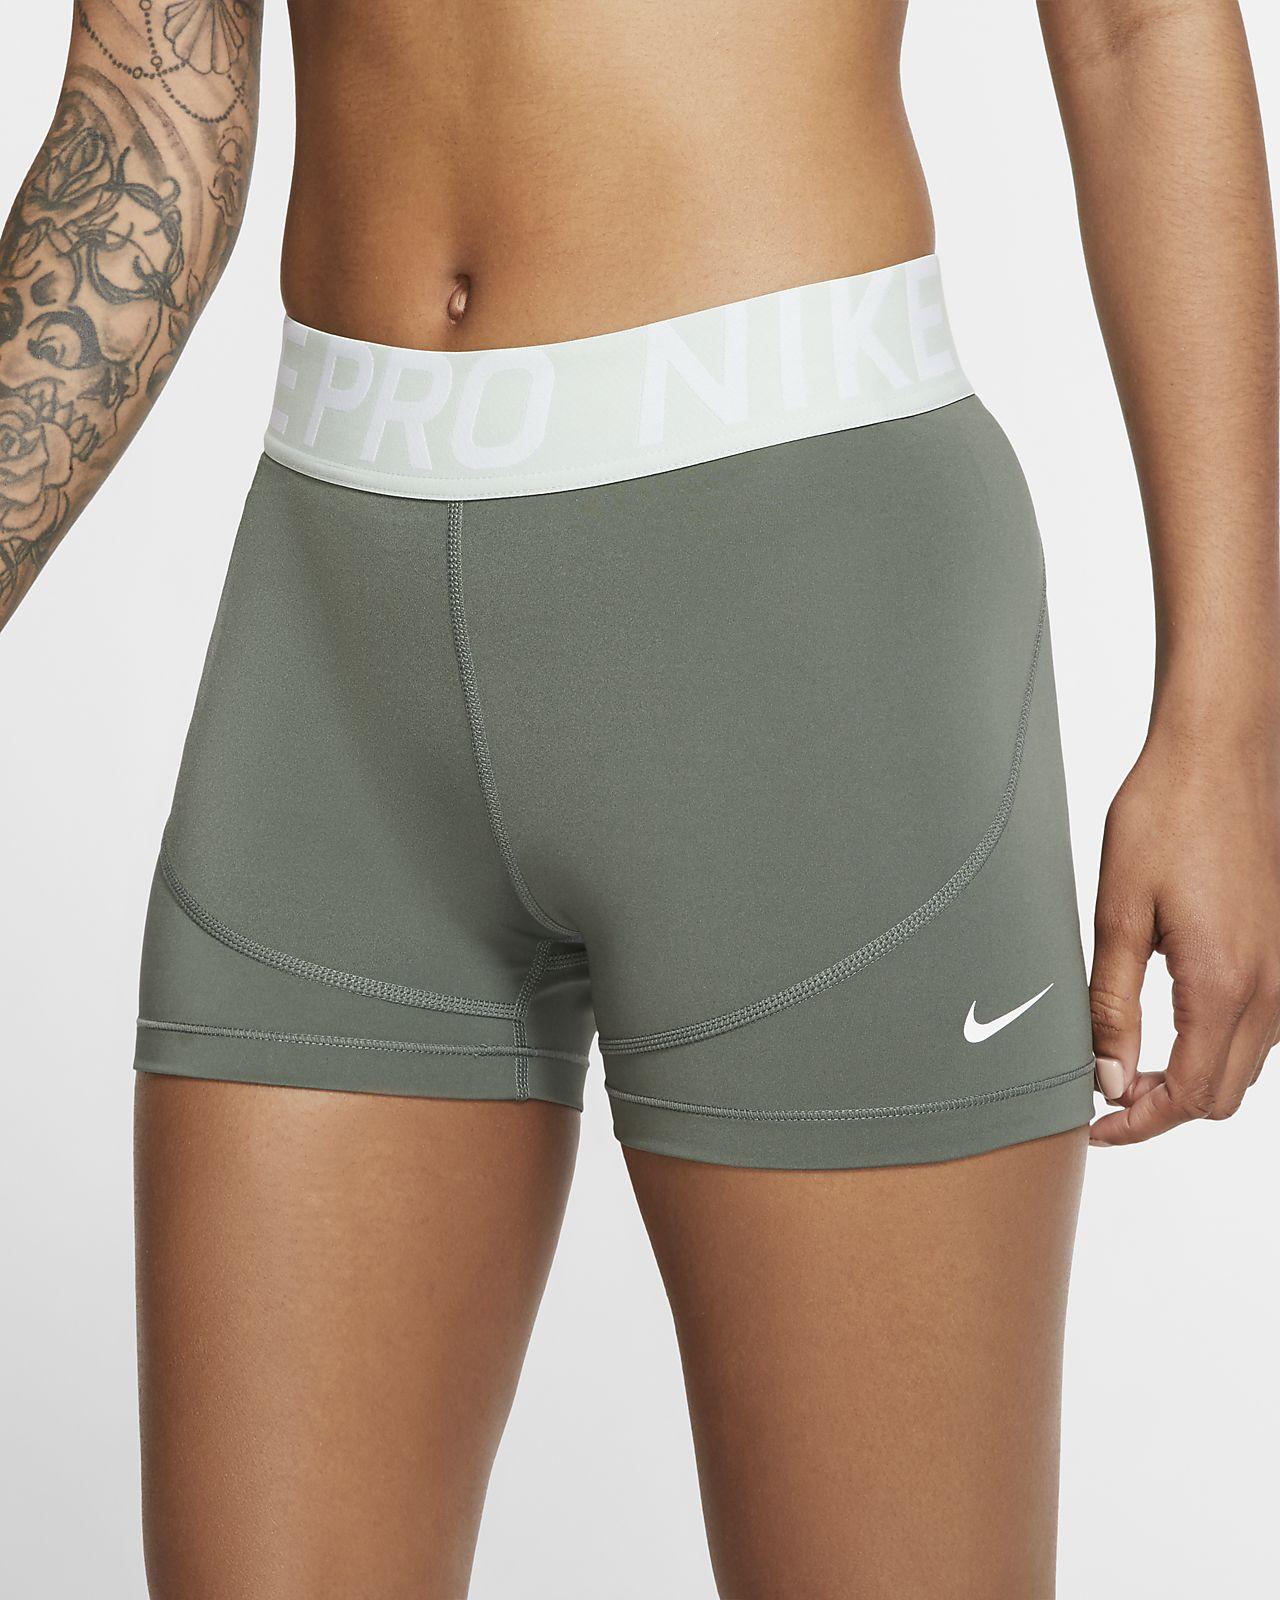 Nike Pro Damen-Trainingsshorts (ca. 7,5 cm)